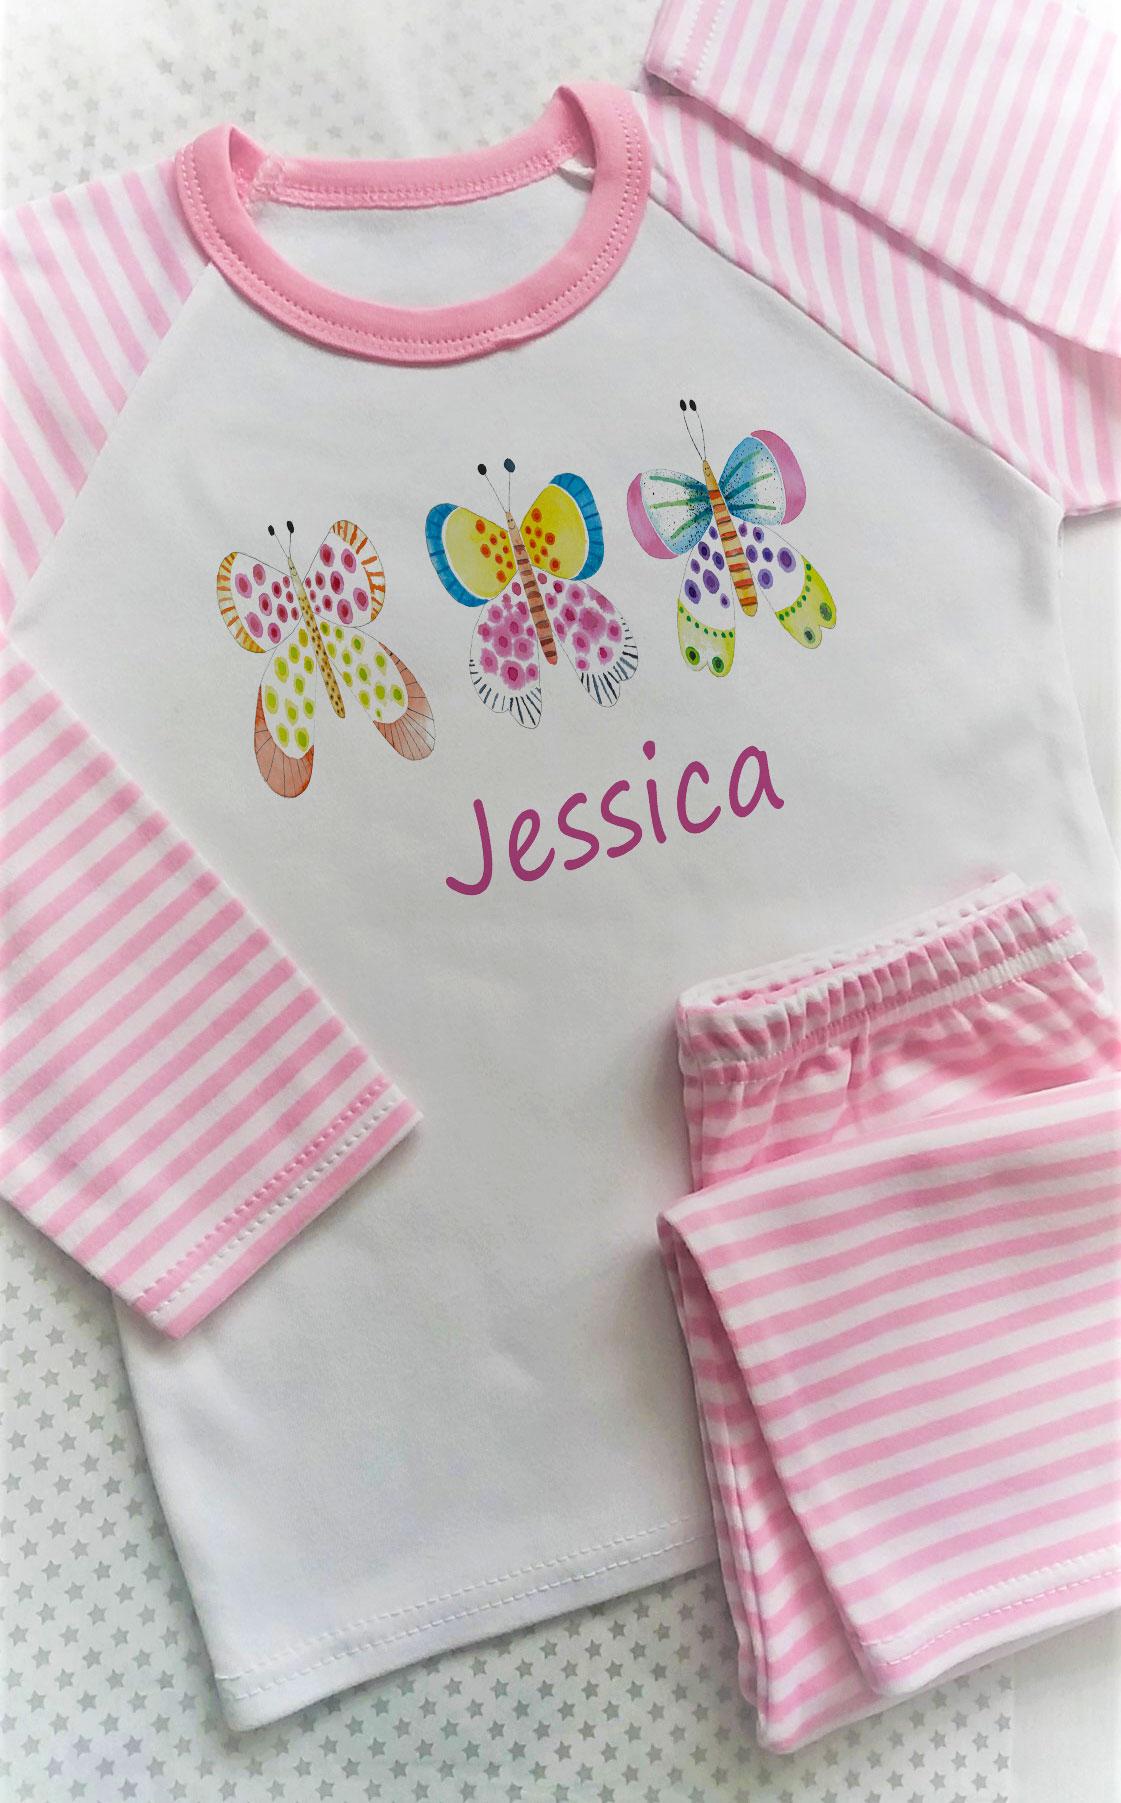 personalised girls clothing